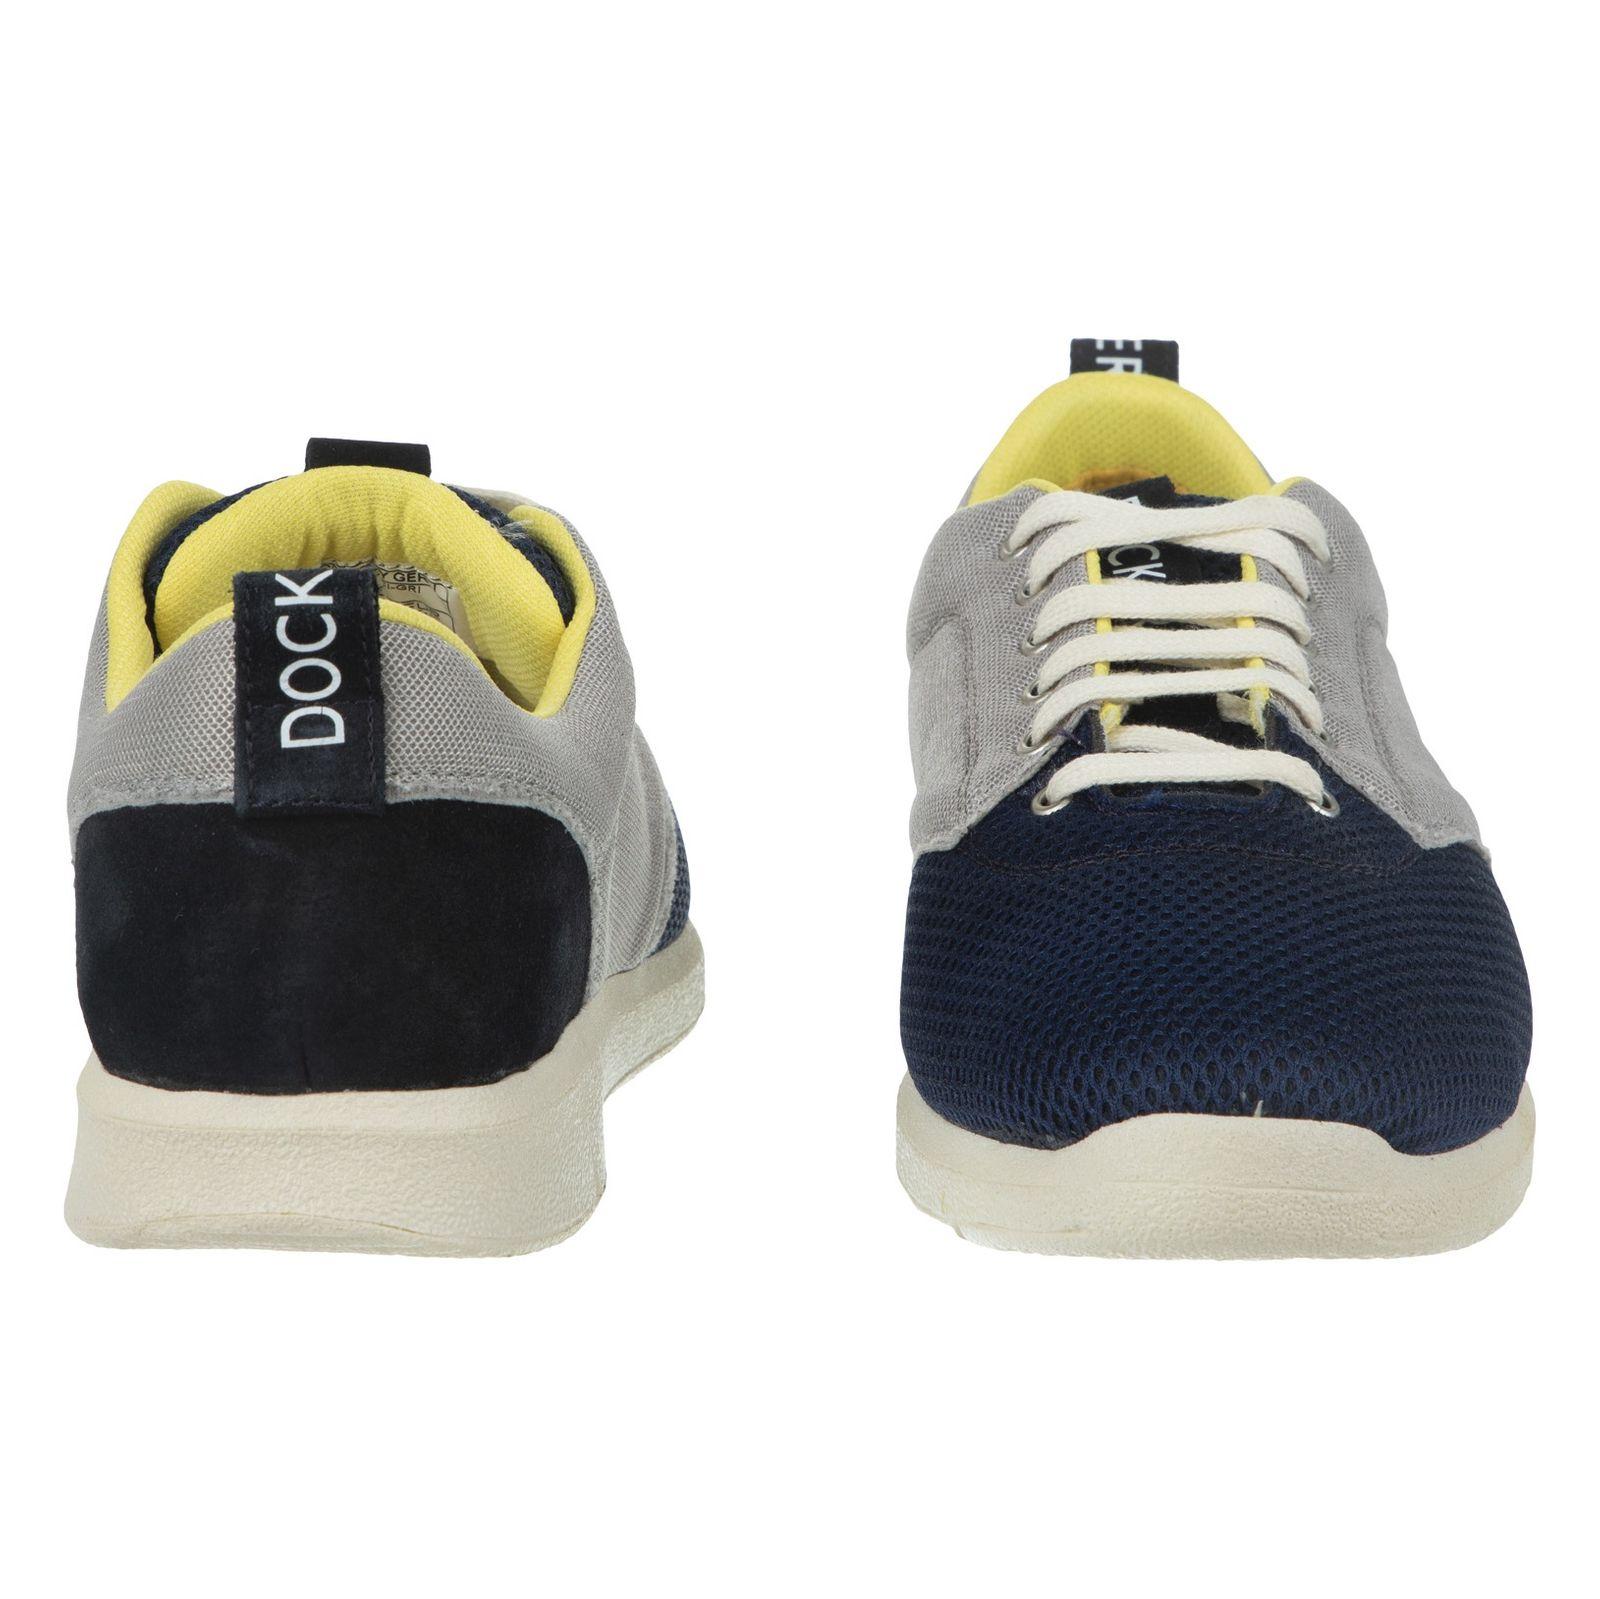 کفش روزمره مردانه داکرز مدل 100209331-101 - مشکی - 3